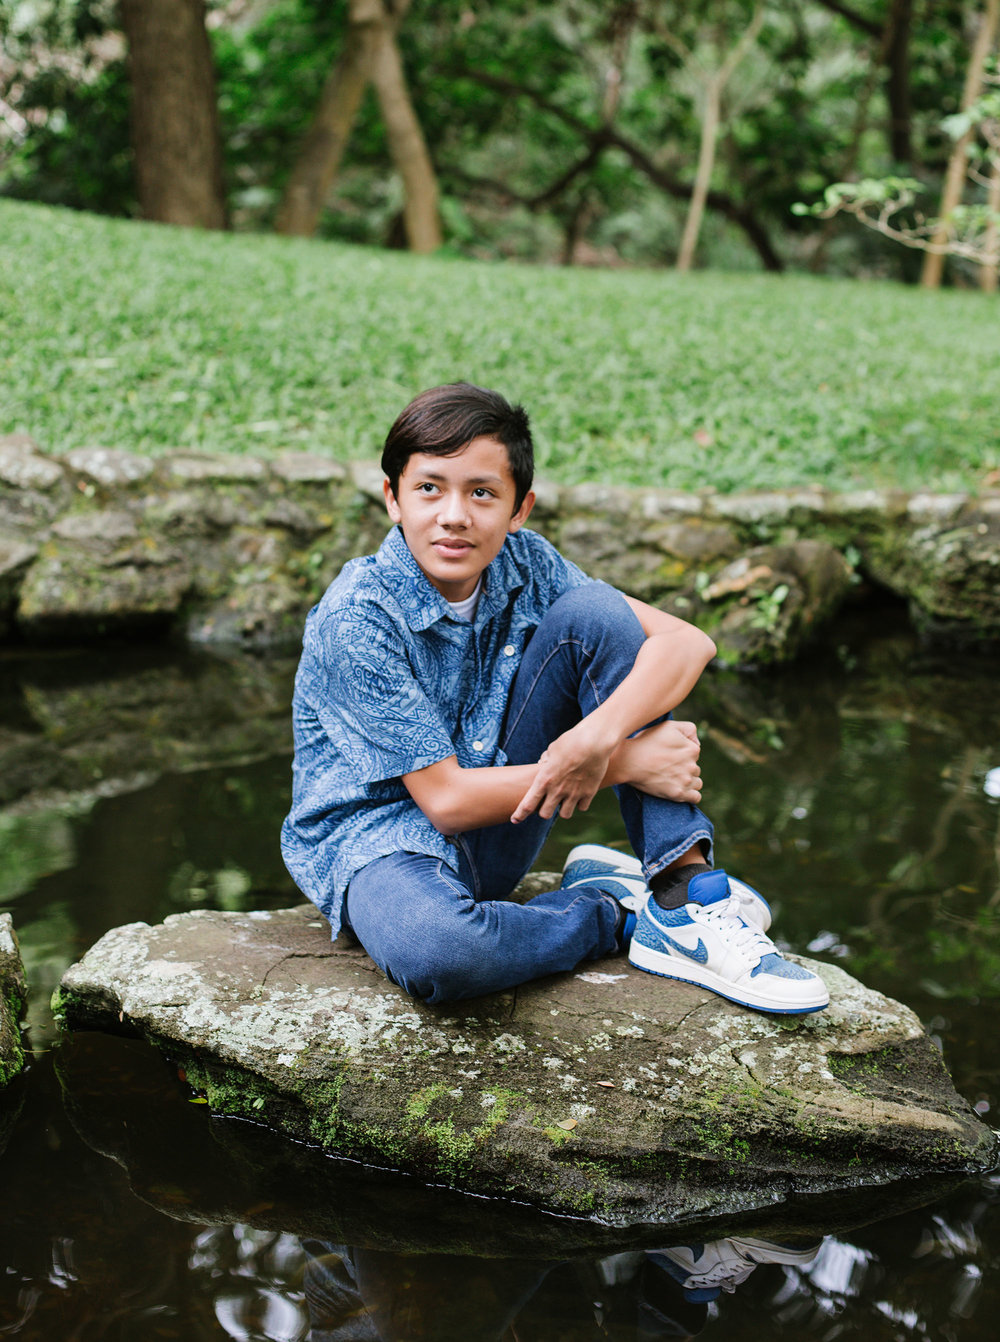 joy-uyeno-sudbury-family-photographer-travel-hawaii-3.jpg